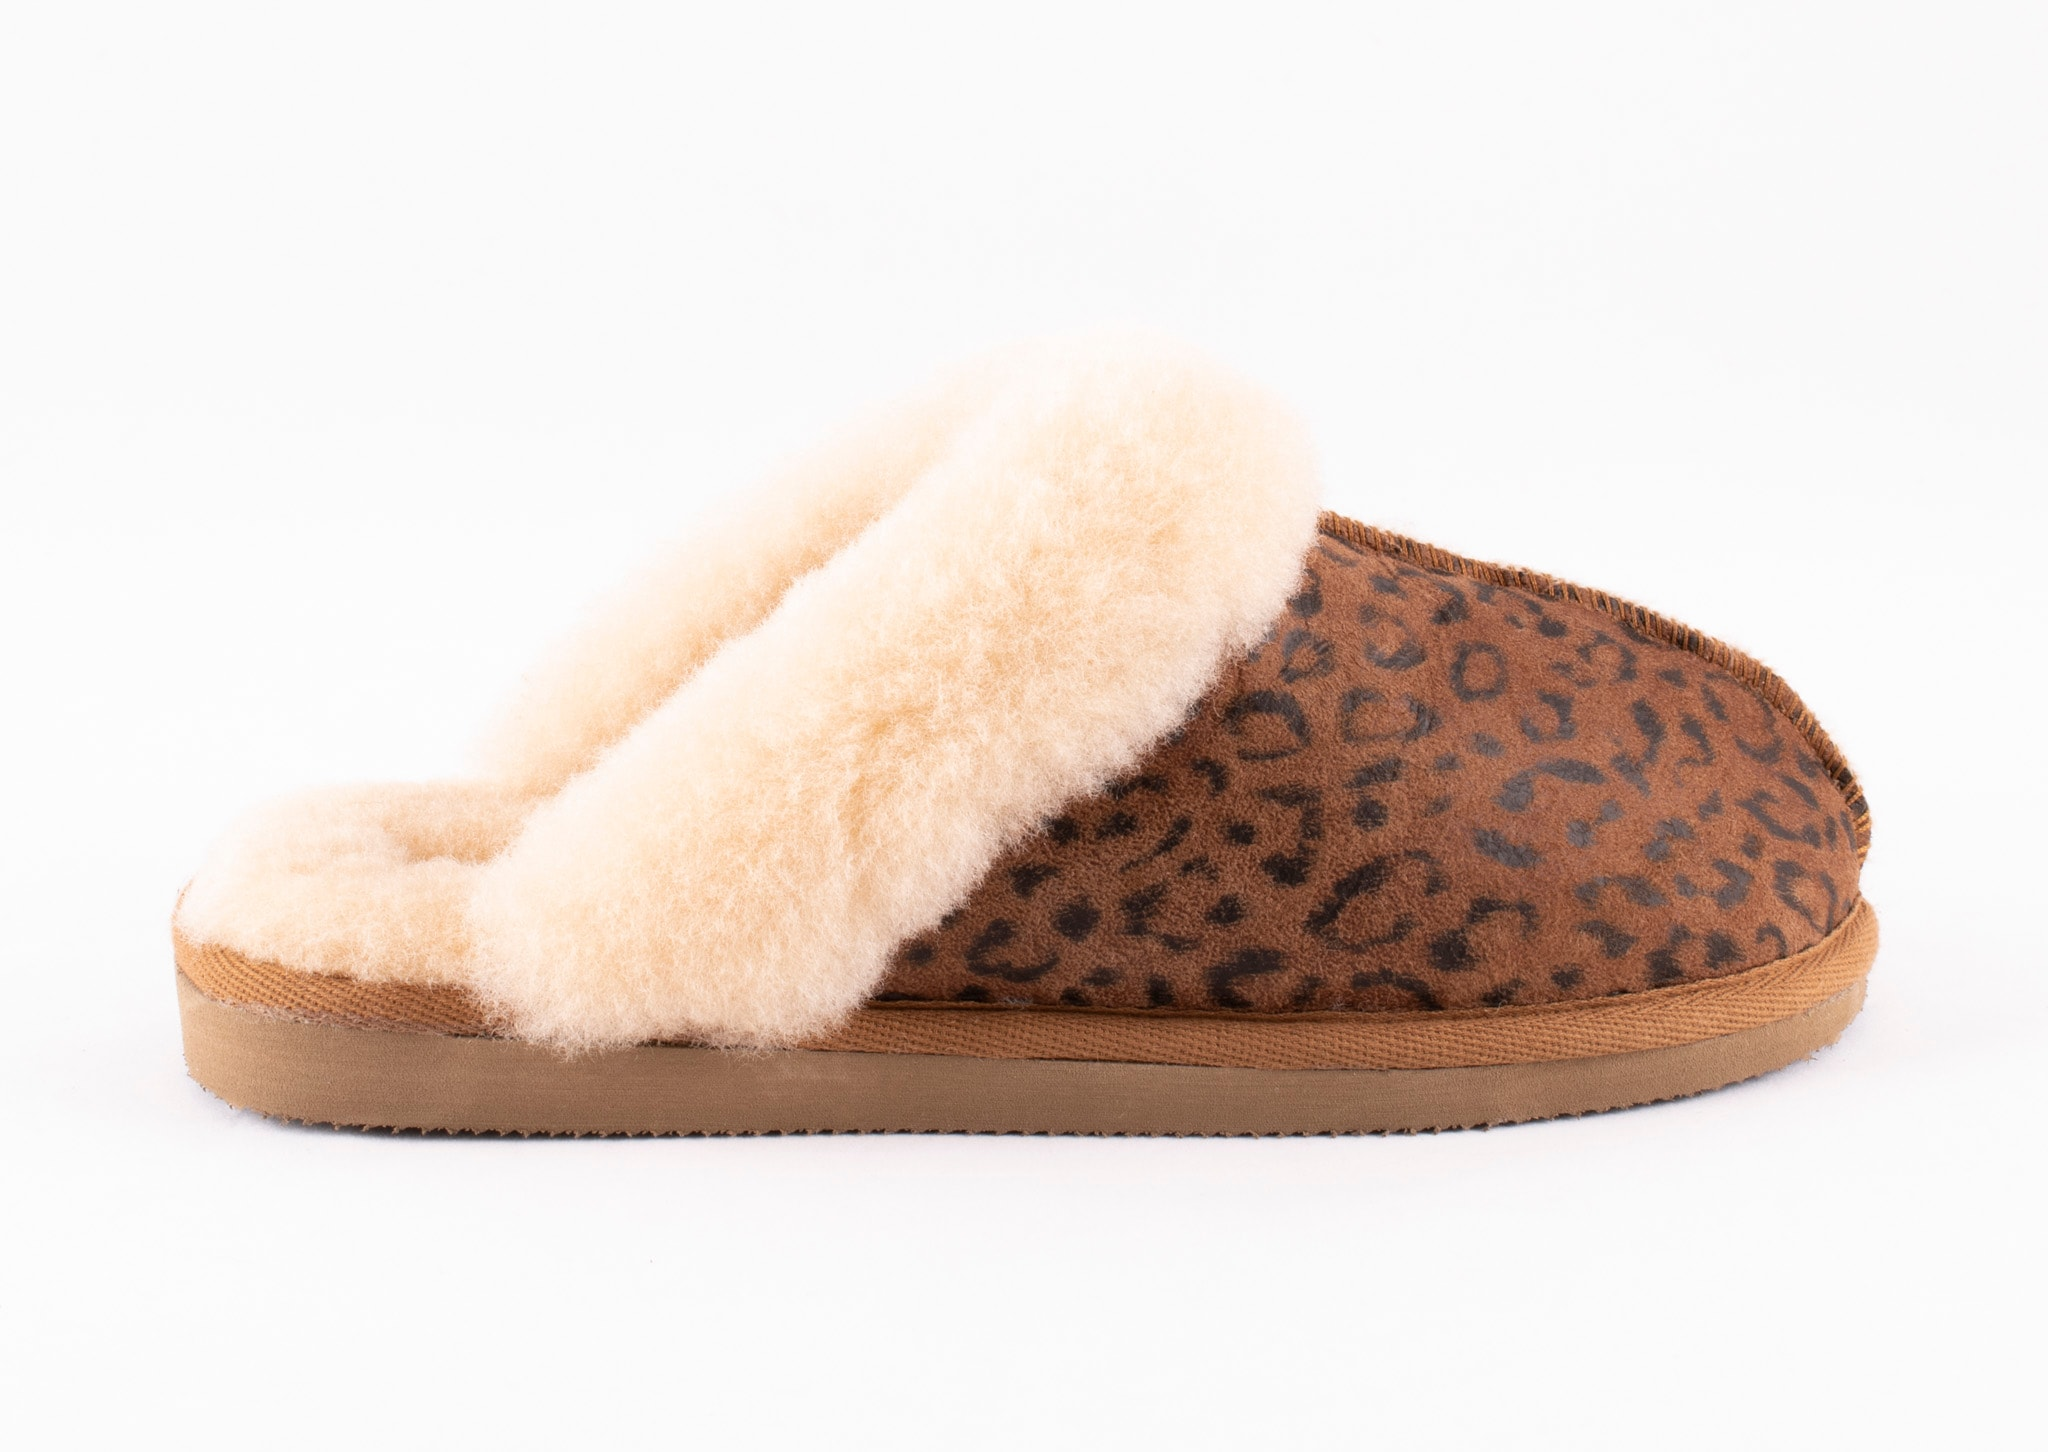 Jessica sheepskin slippers